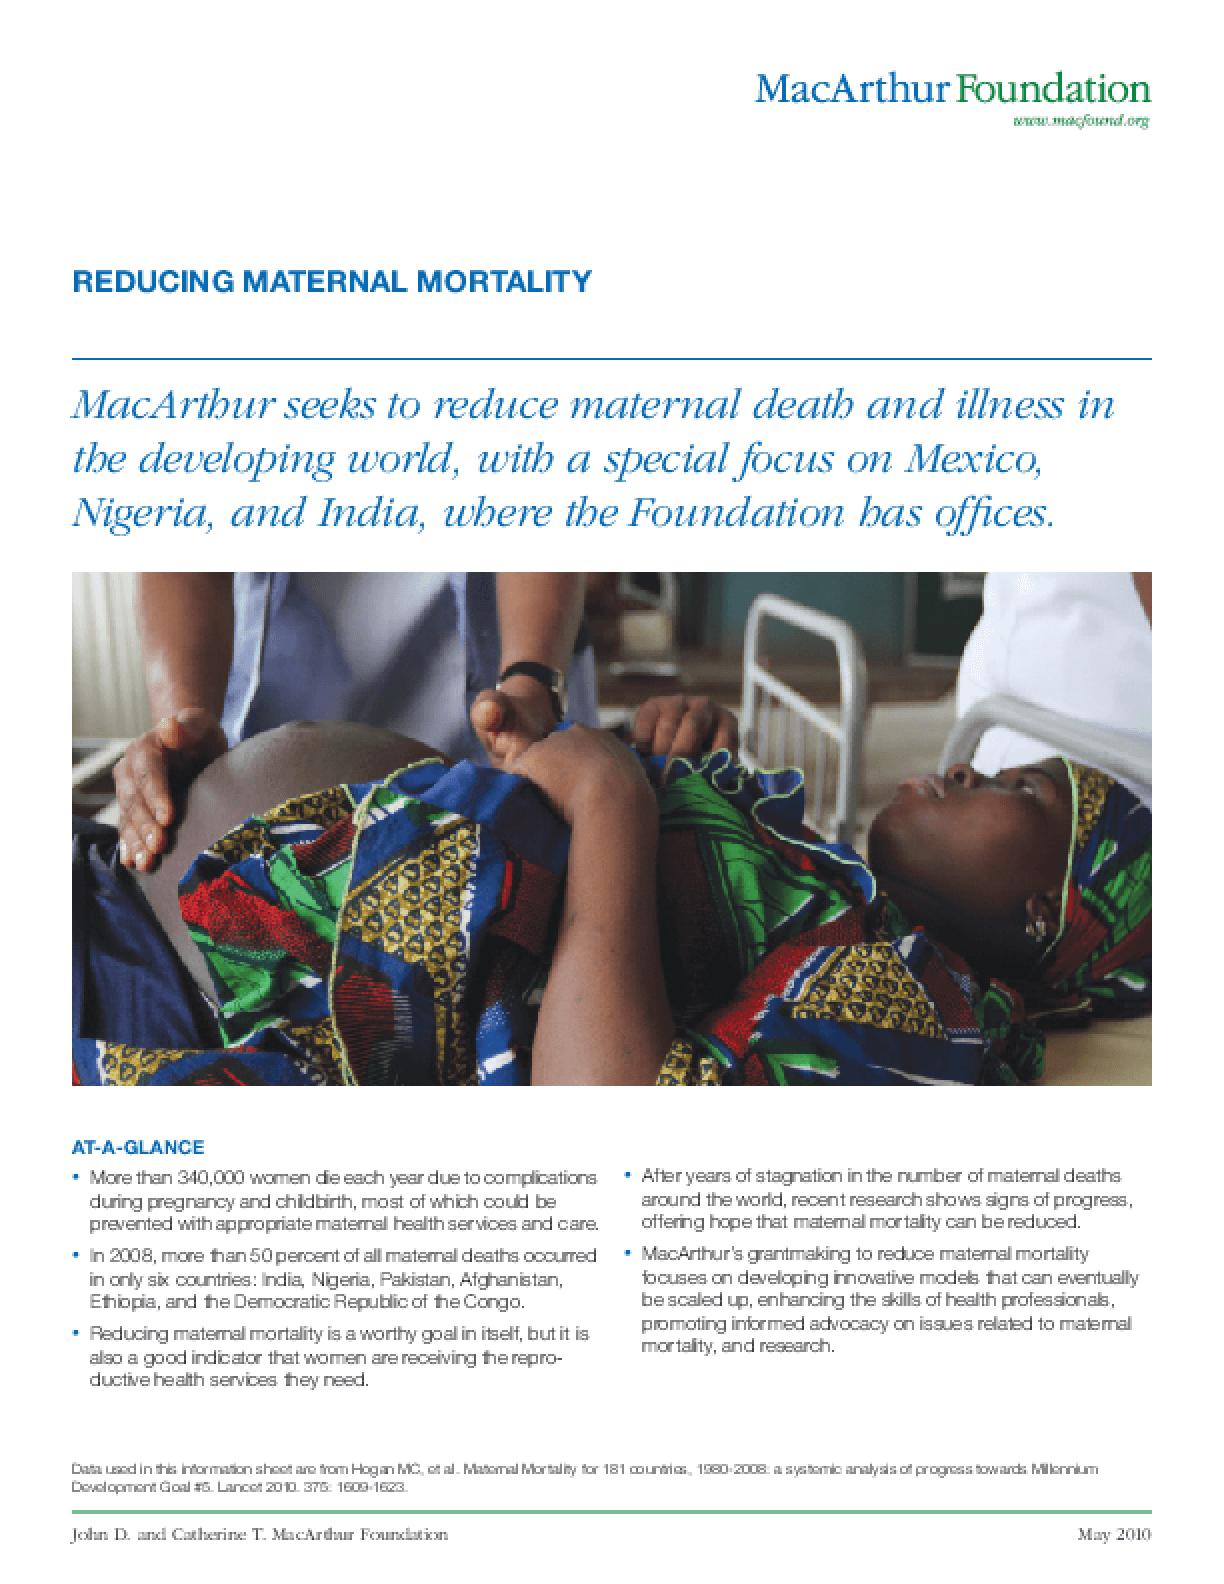 Reducing Maternal Mortality